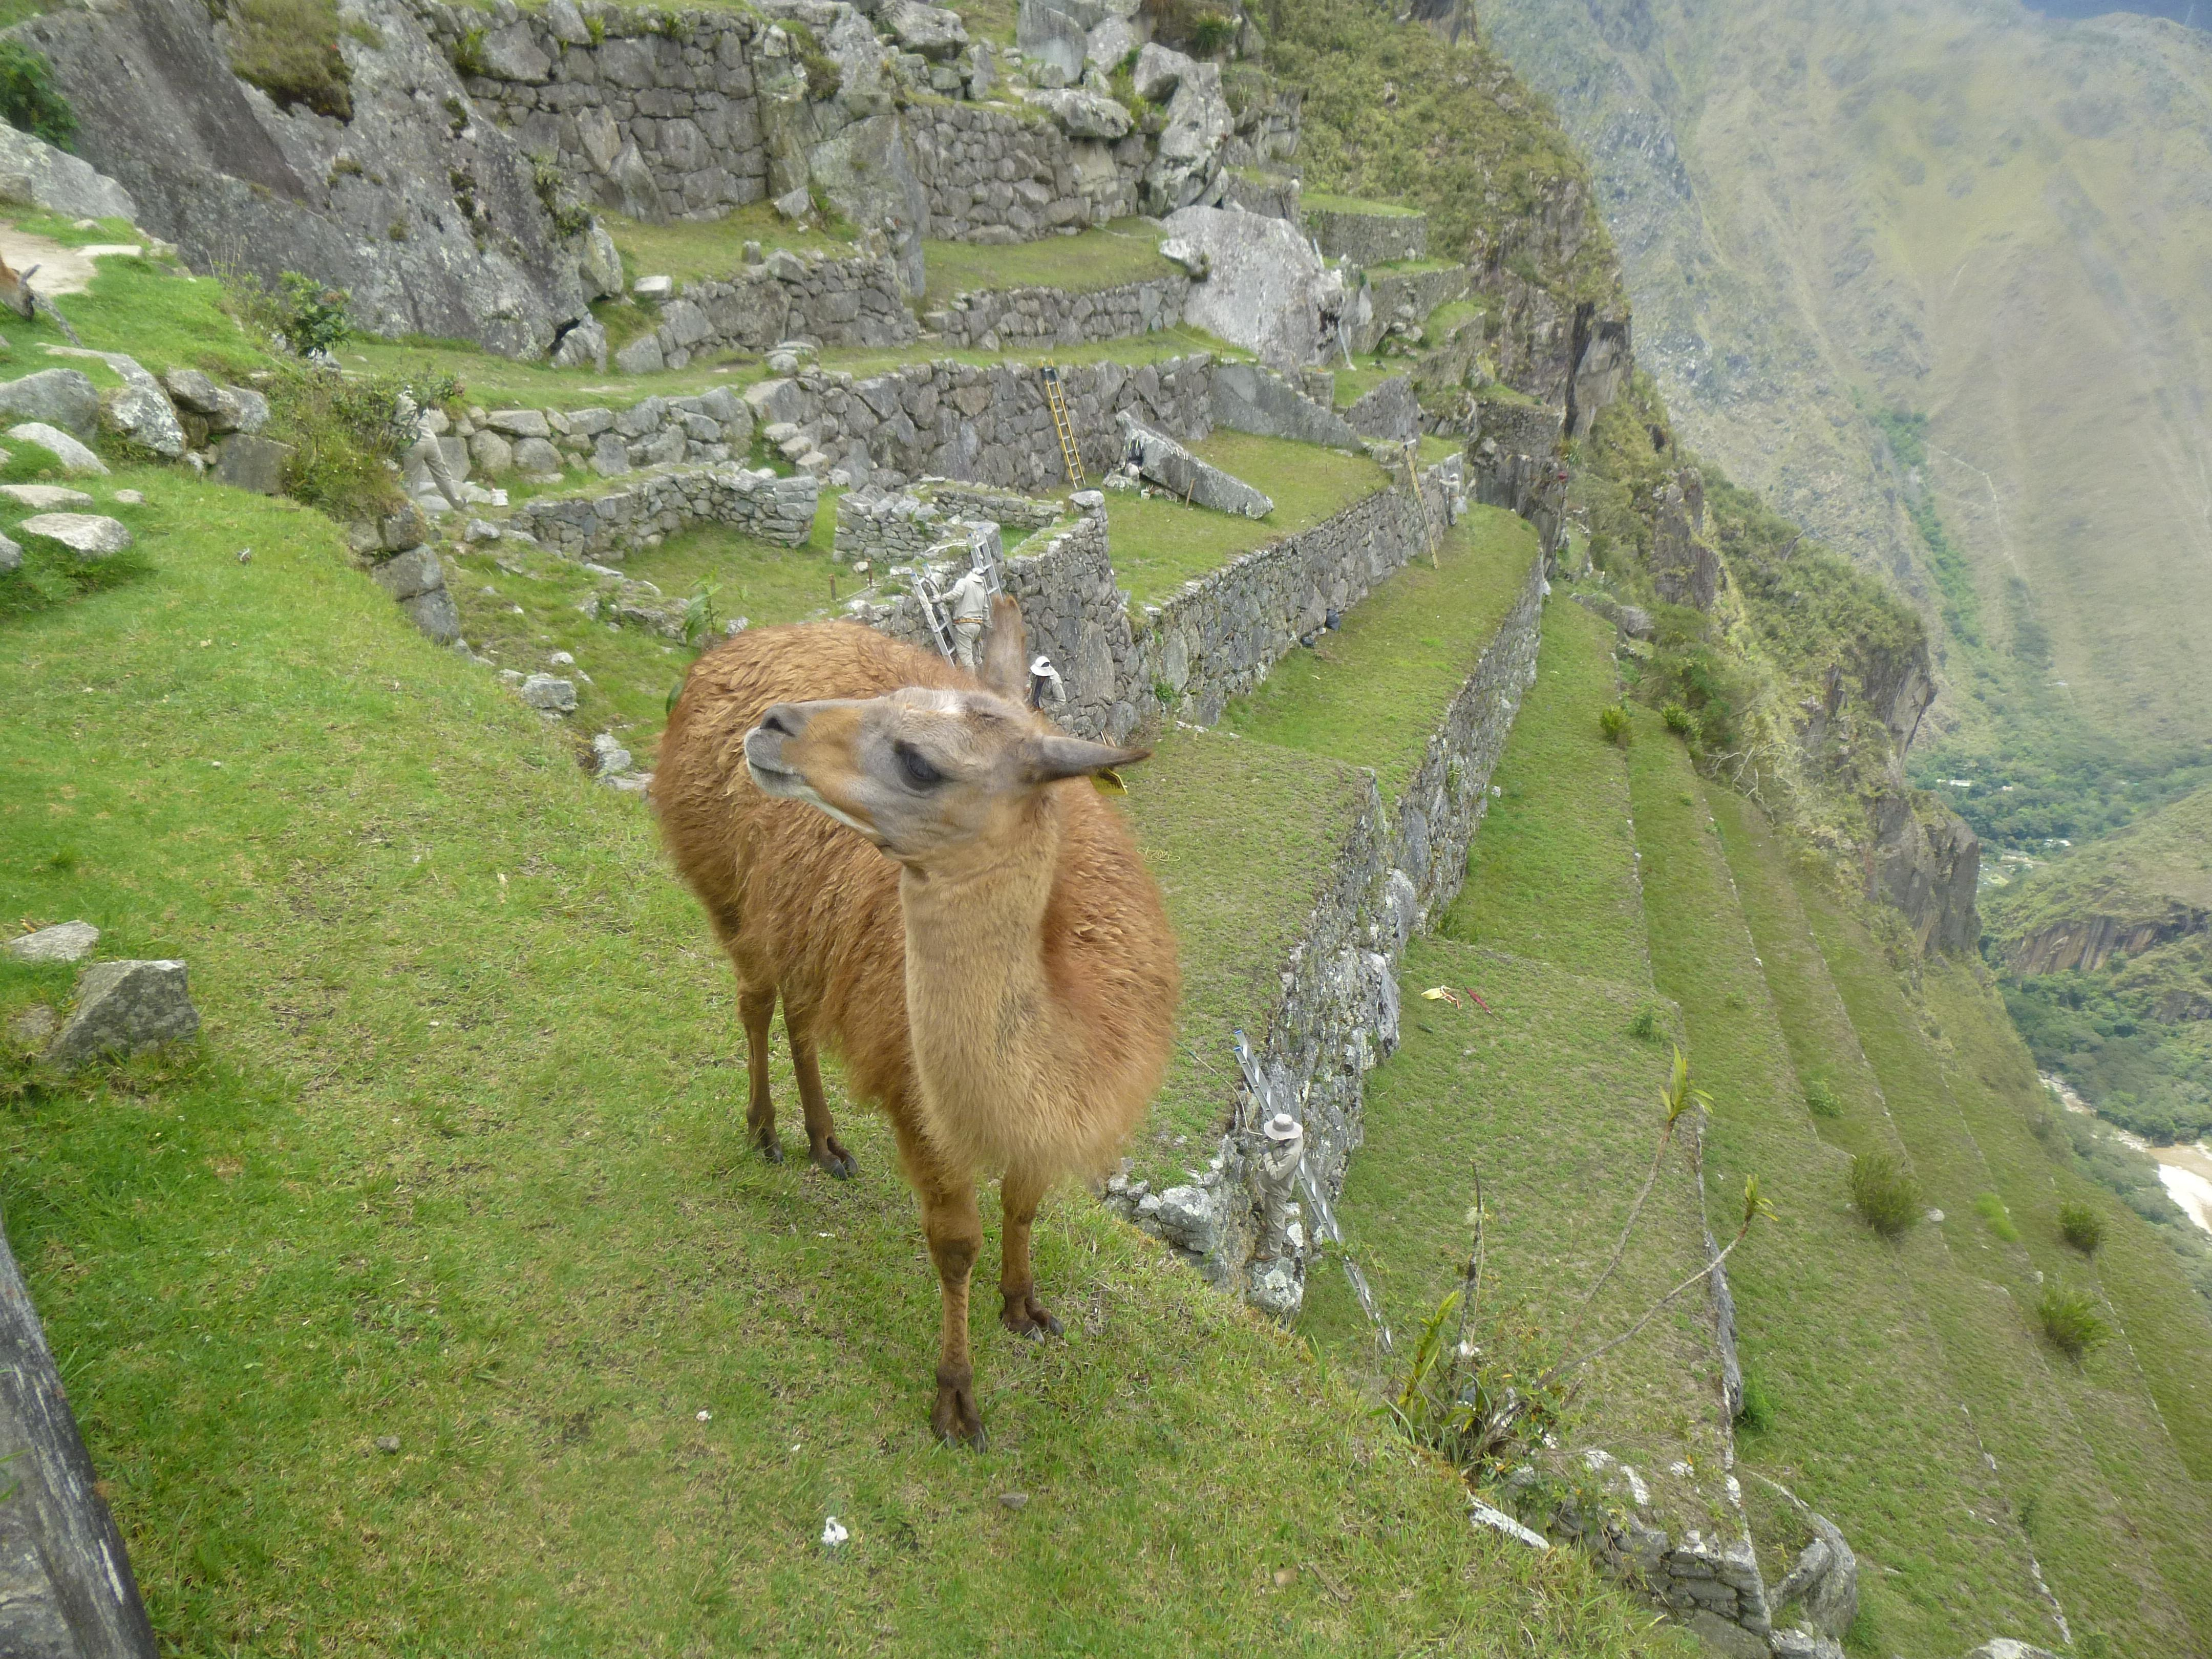 P1030940 - Budget for Volunteering in Rural Peru